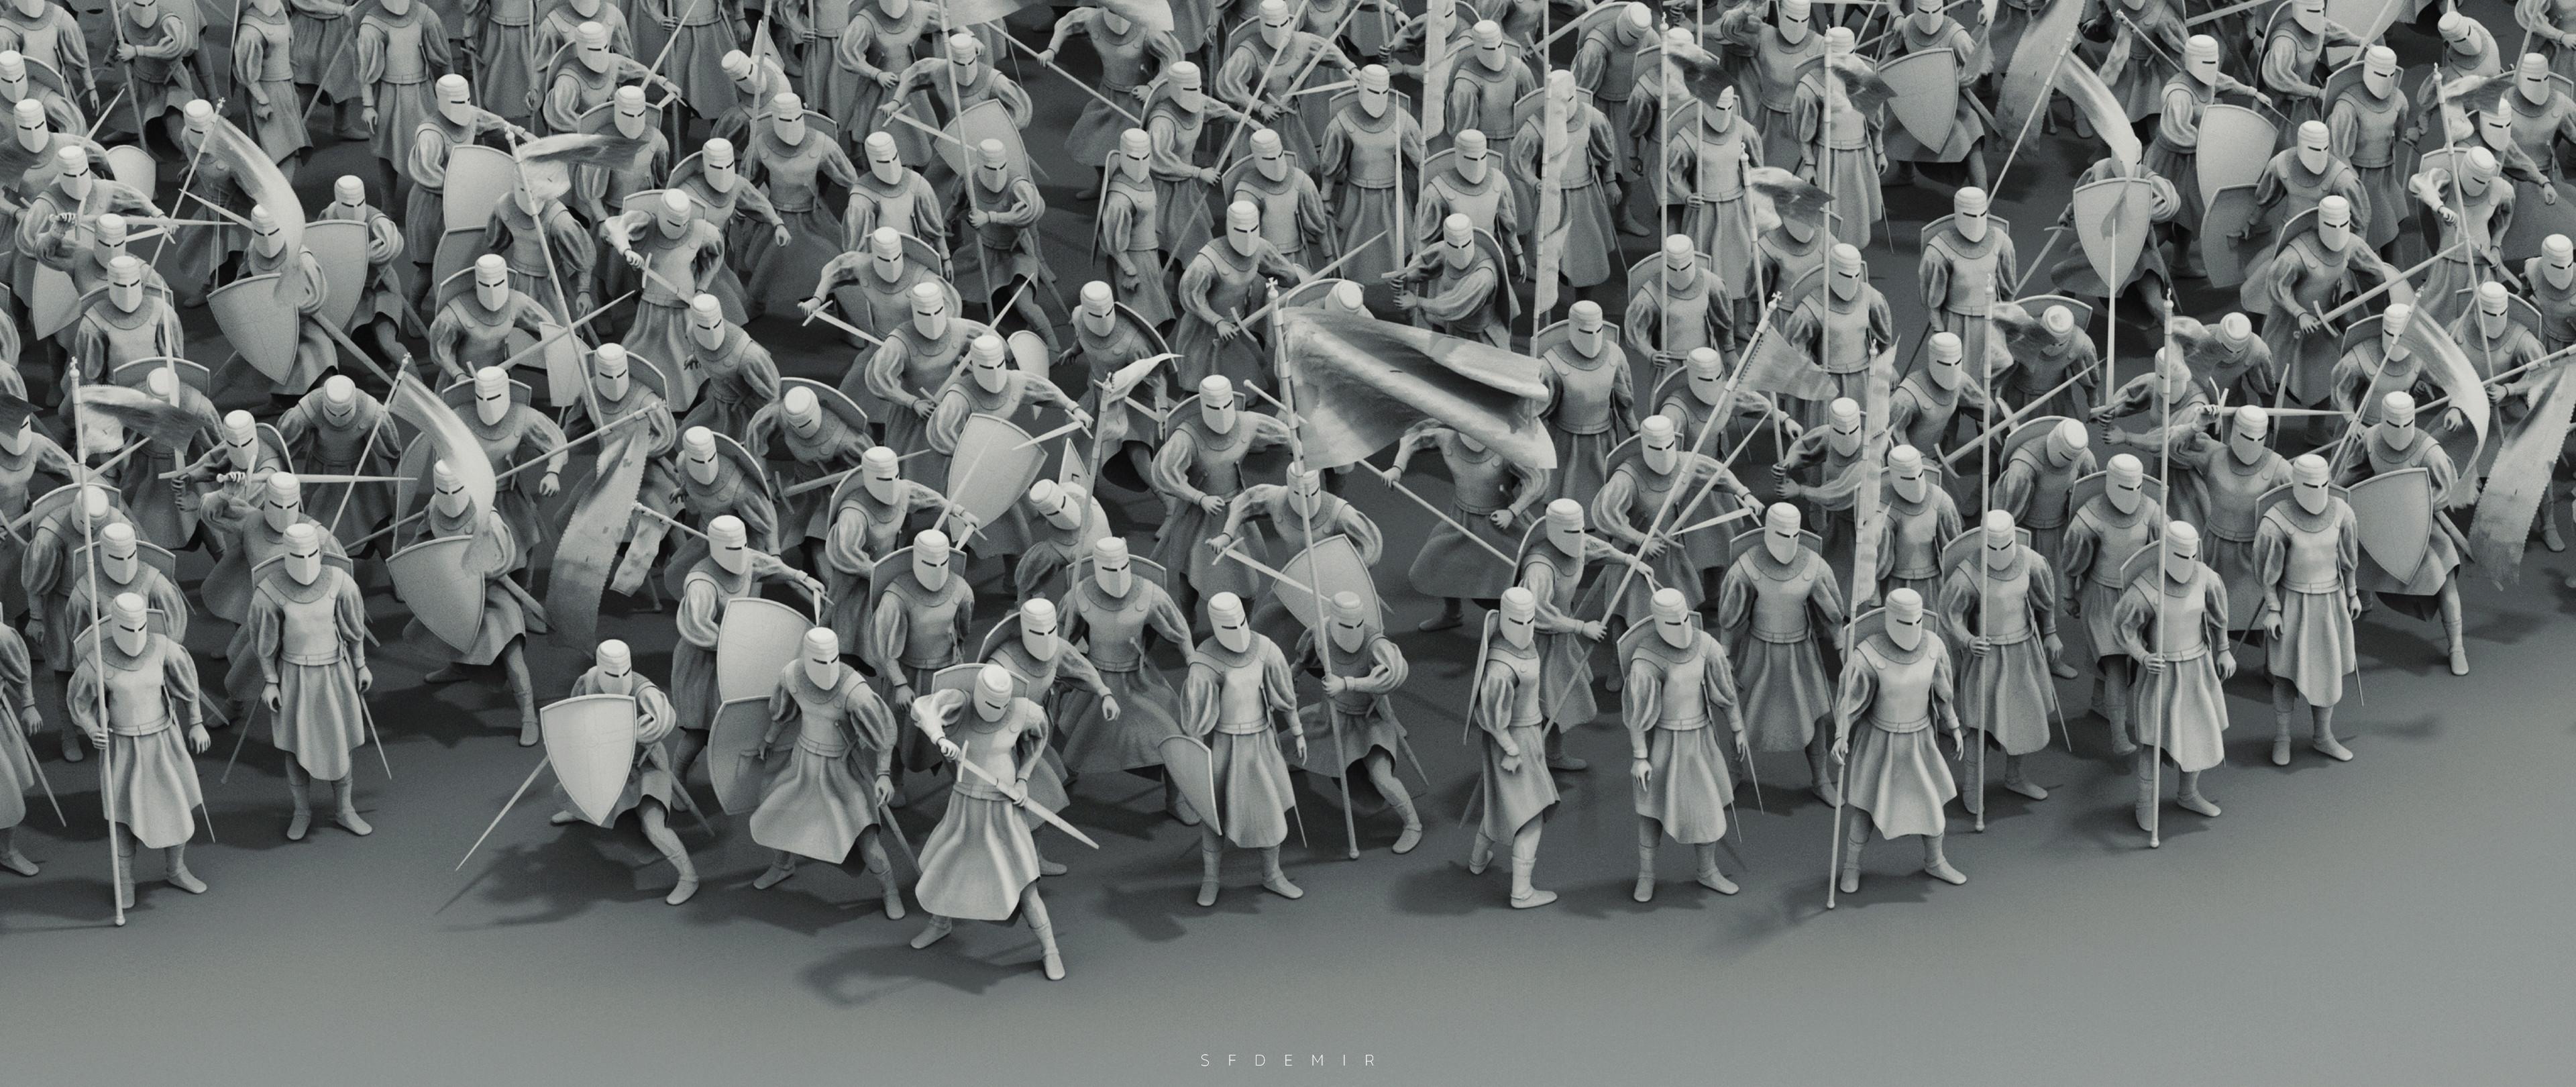 Preparing For War Scene - Shot 05 - Clay Render